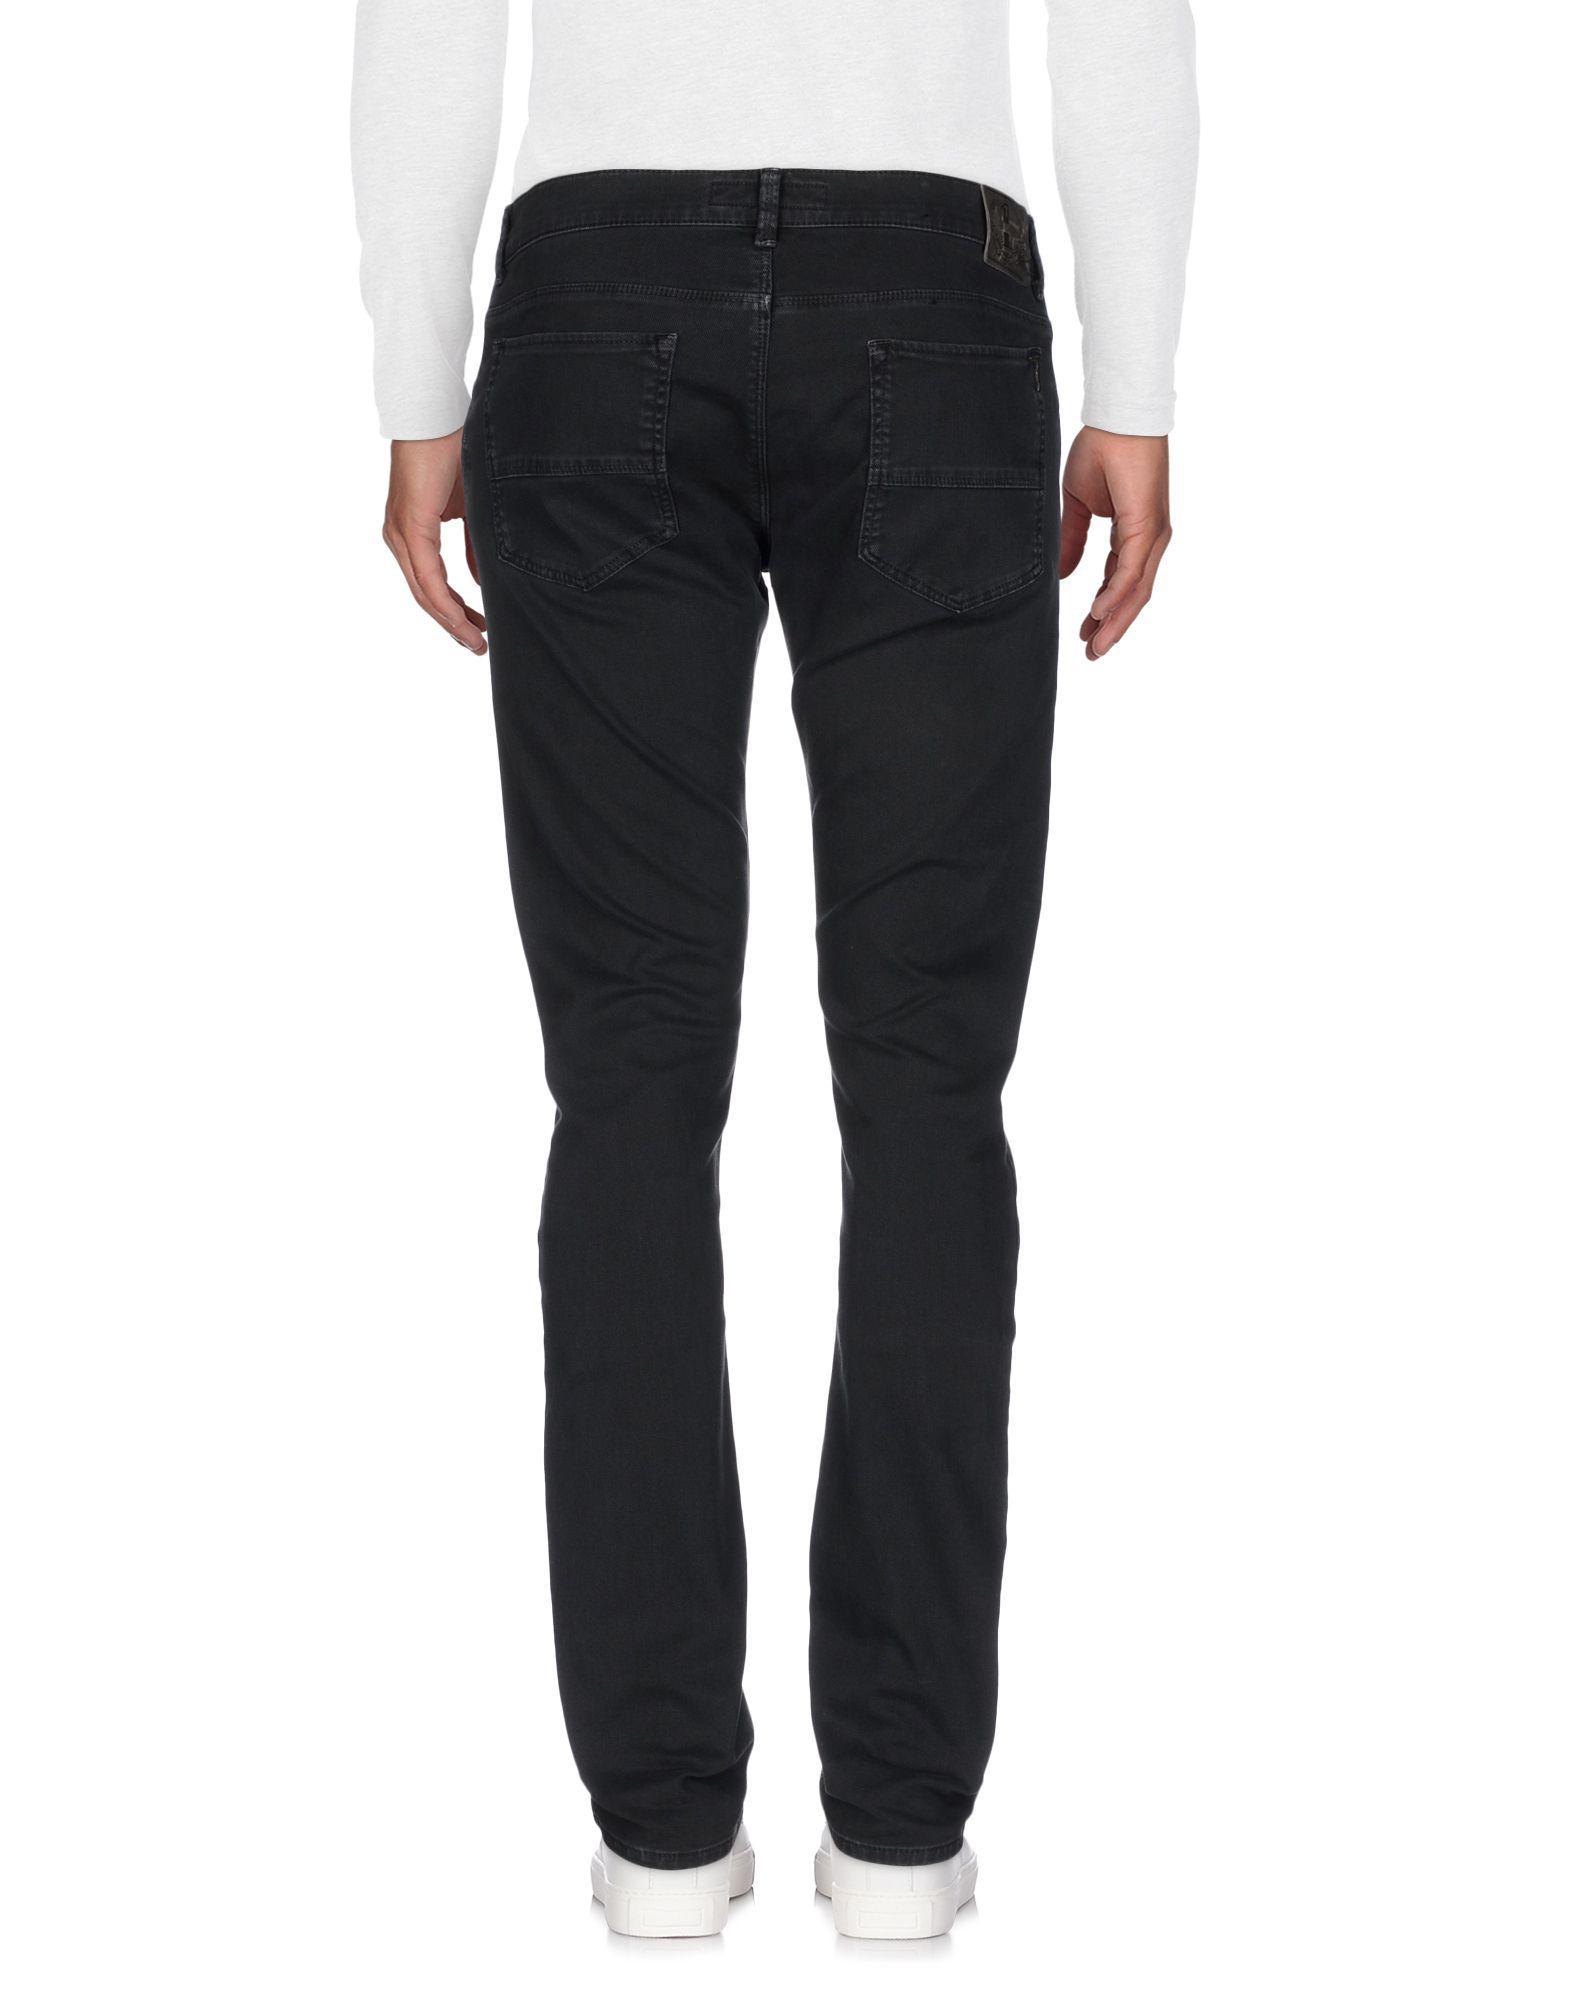 Trussardi Denim Trousers in Steel Grey (Grey) for Men